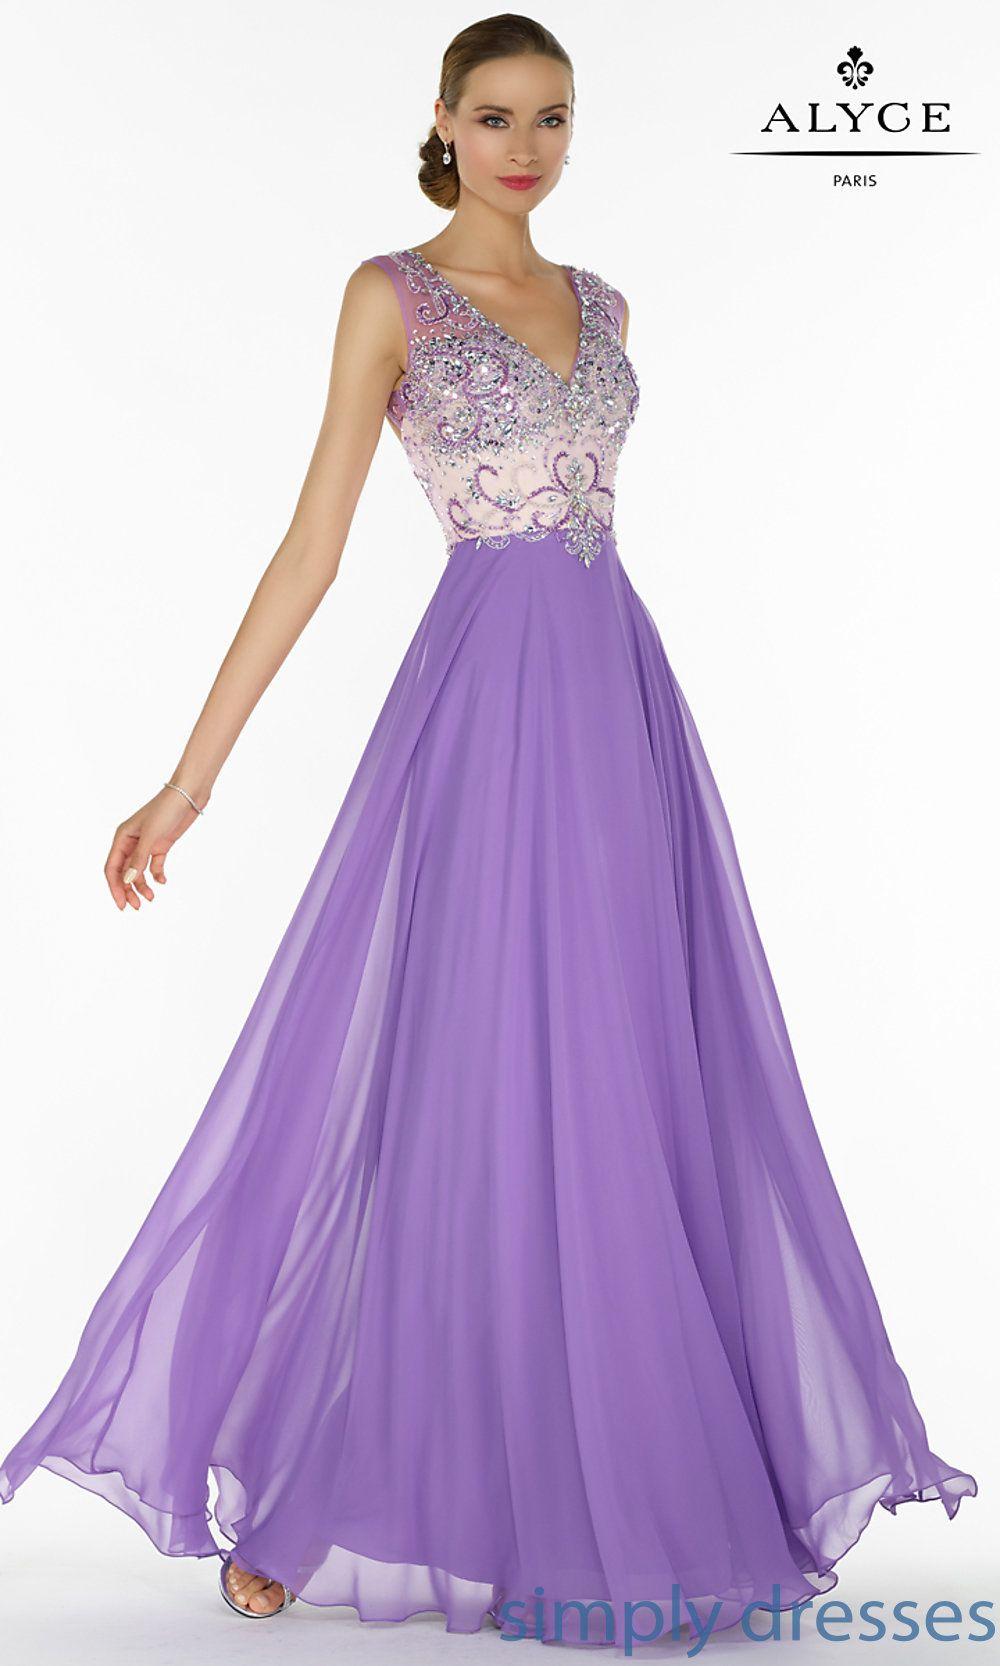 Aljdl alyce long vneck prom dress